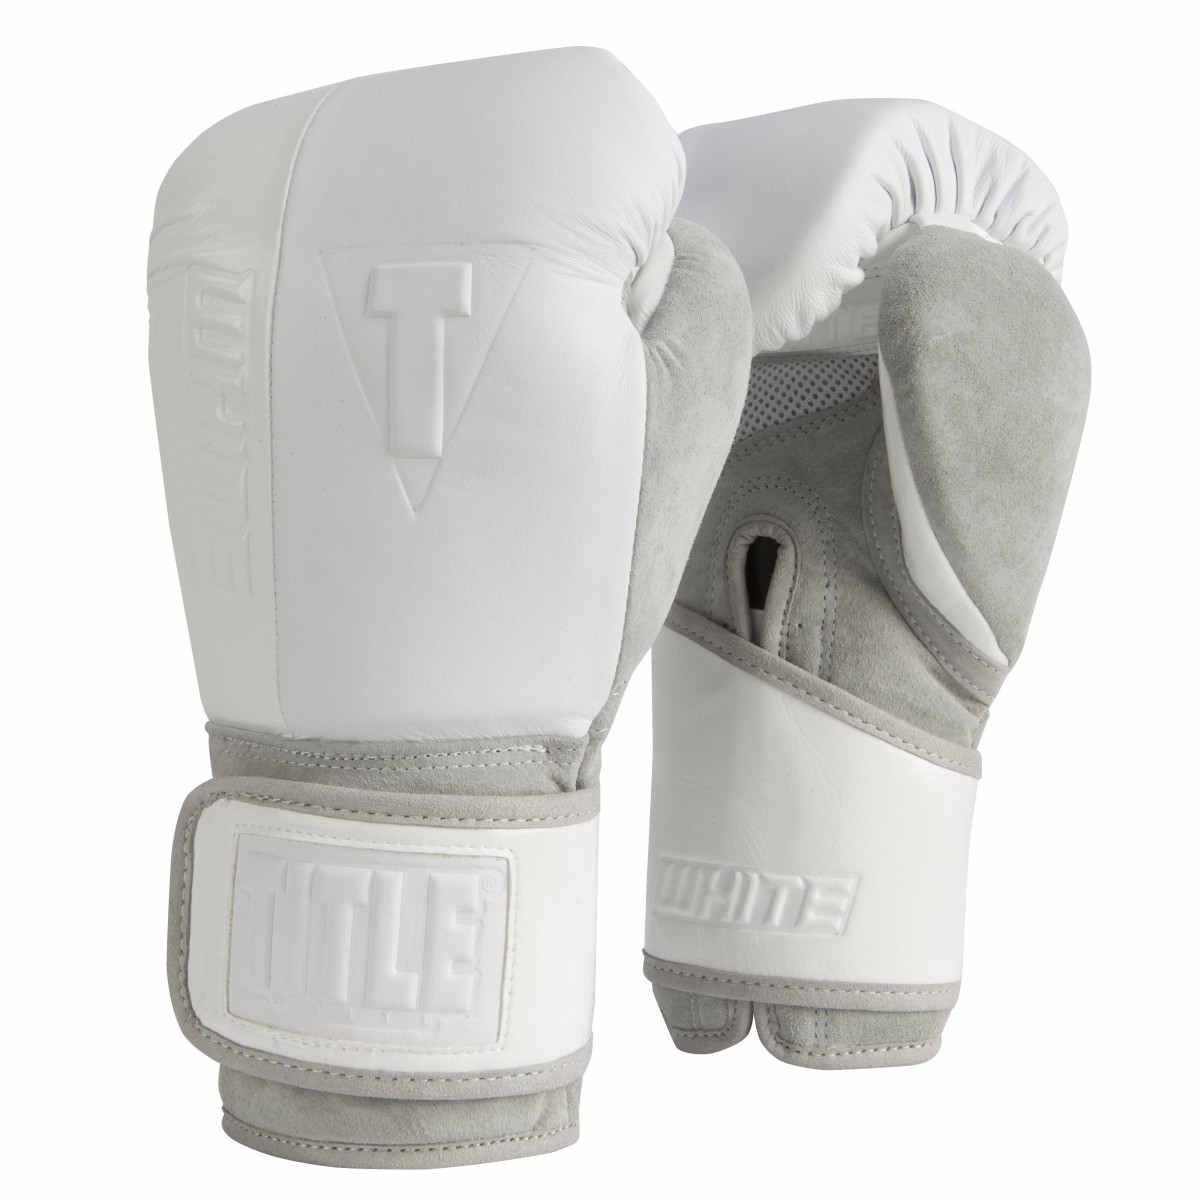 Боксерские перчатки TITLE WHITE Training Gloves